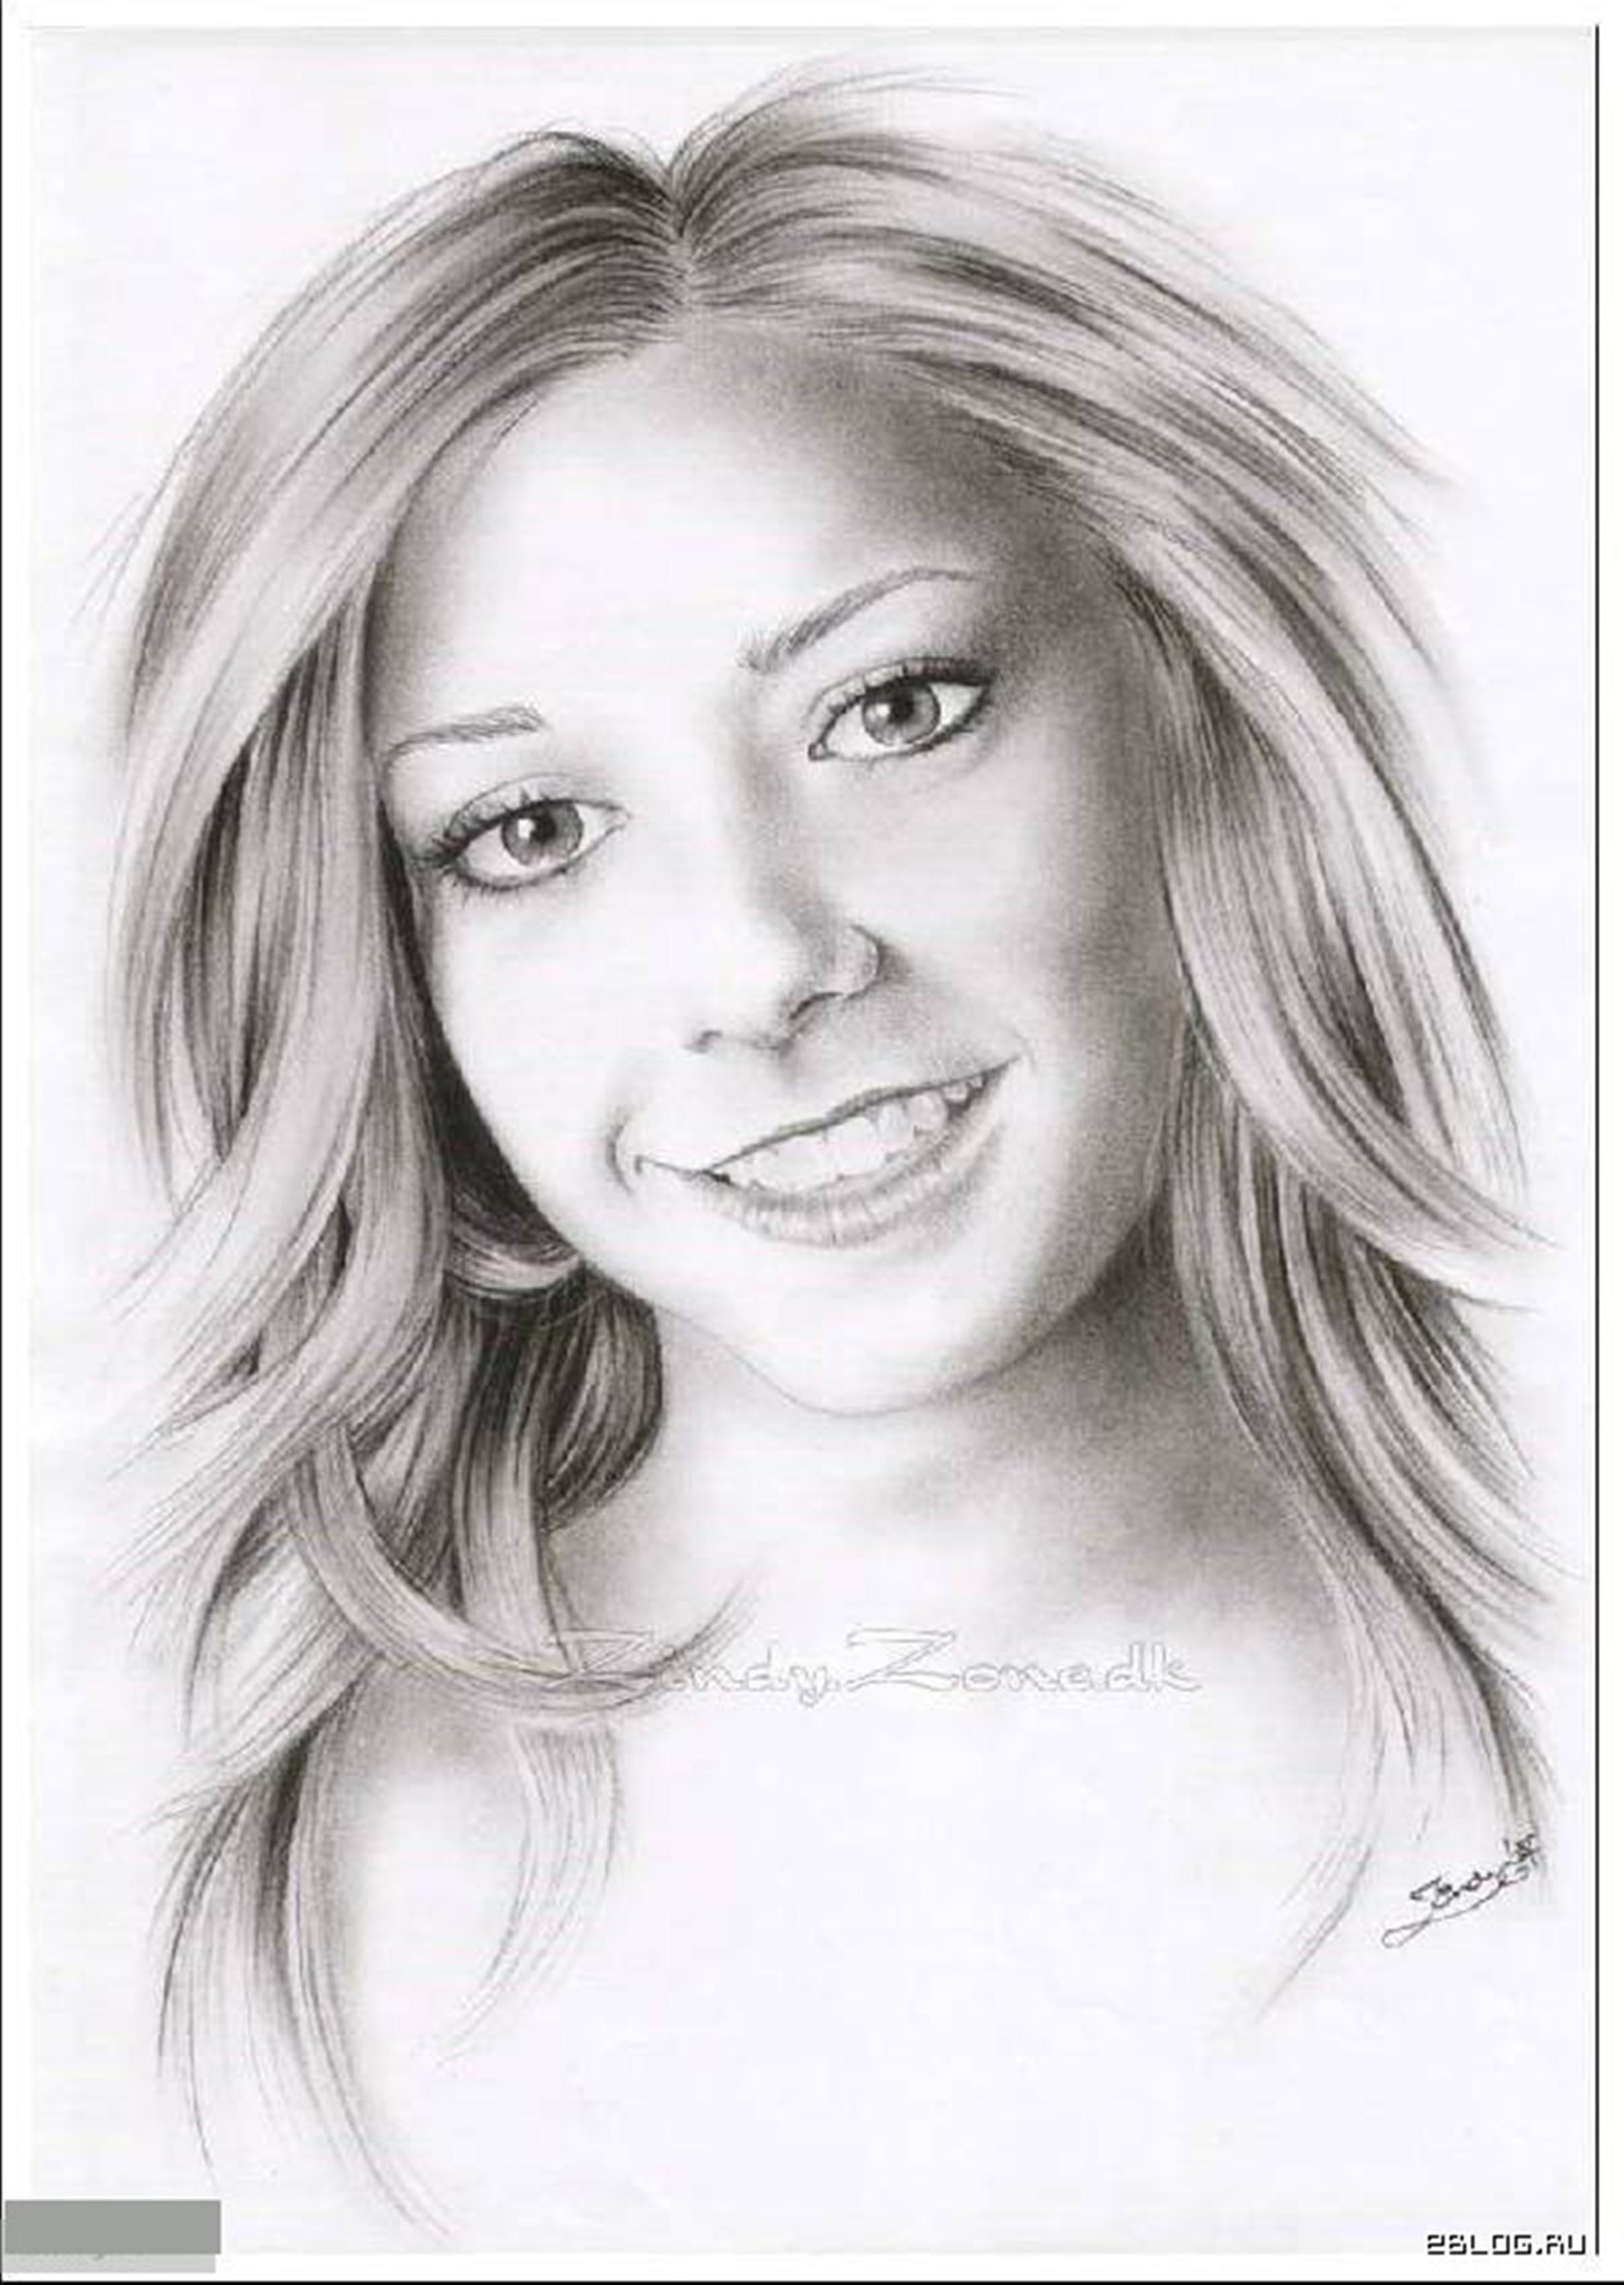 Программа для зарисовки лица на фото 5 фотография